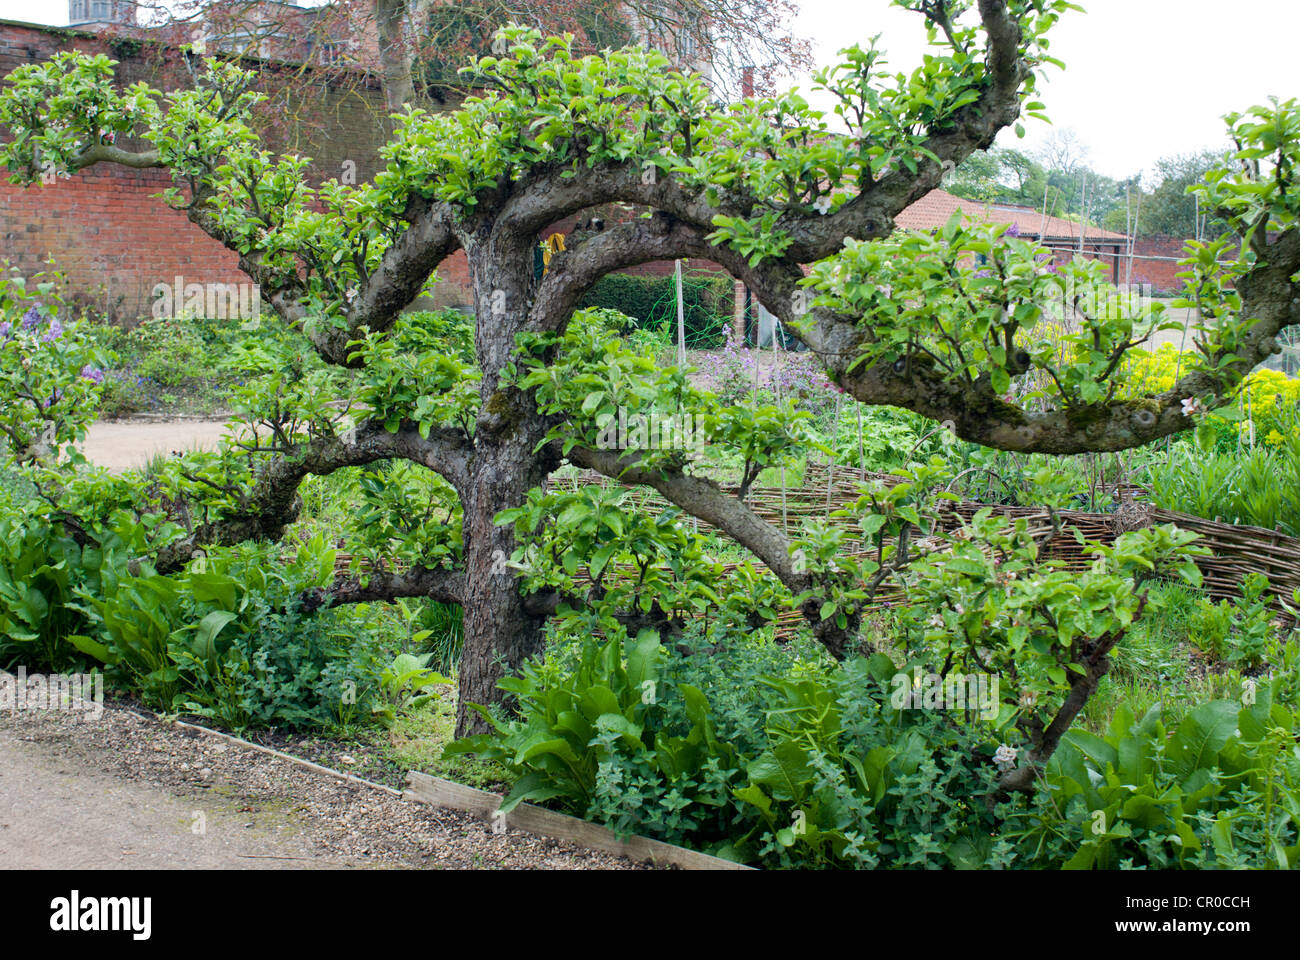 Espalier Apple Tree Growing In A Country Walled Garden